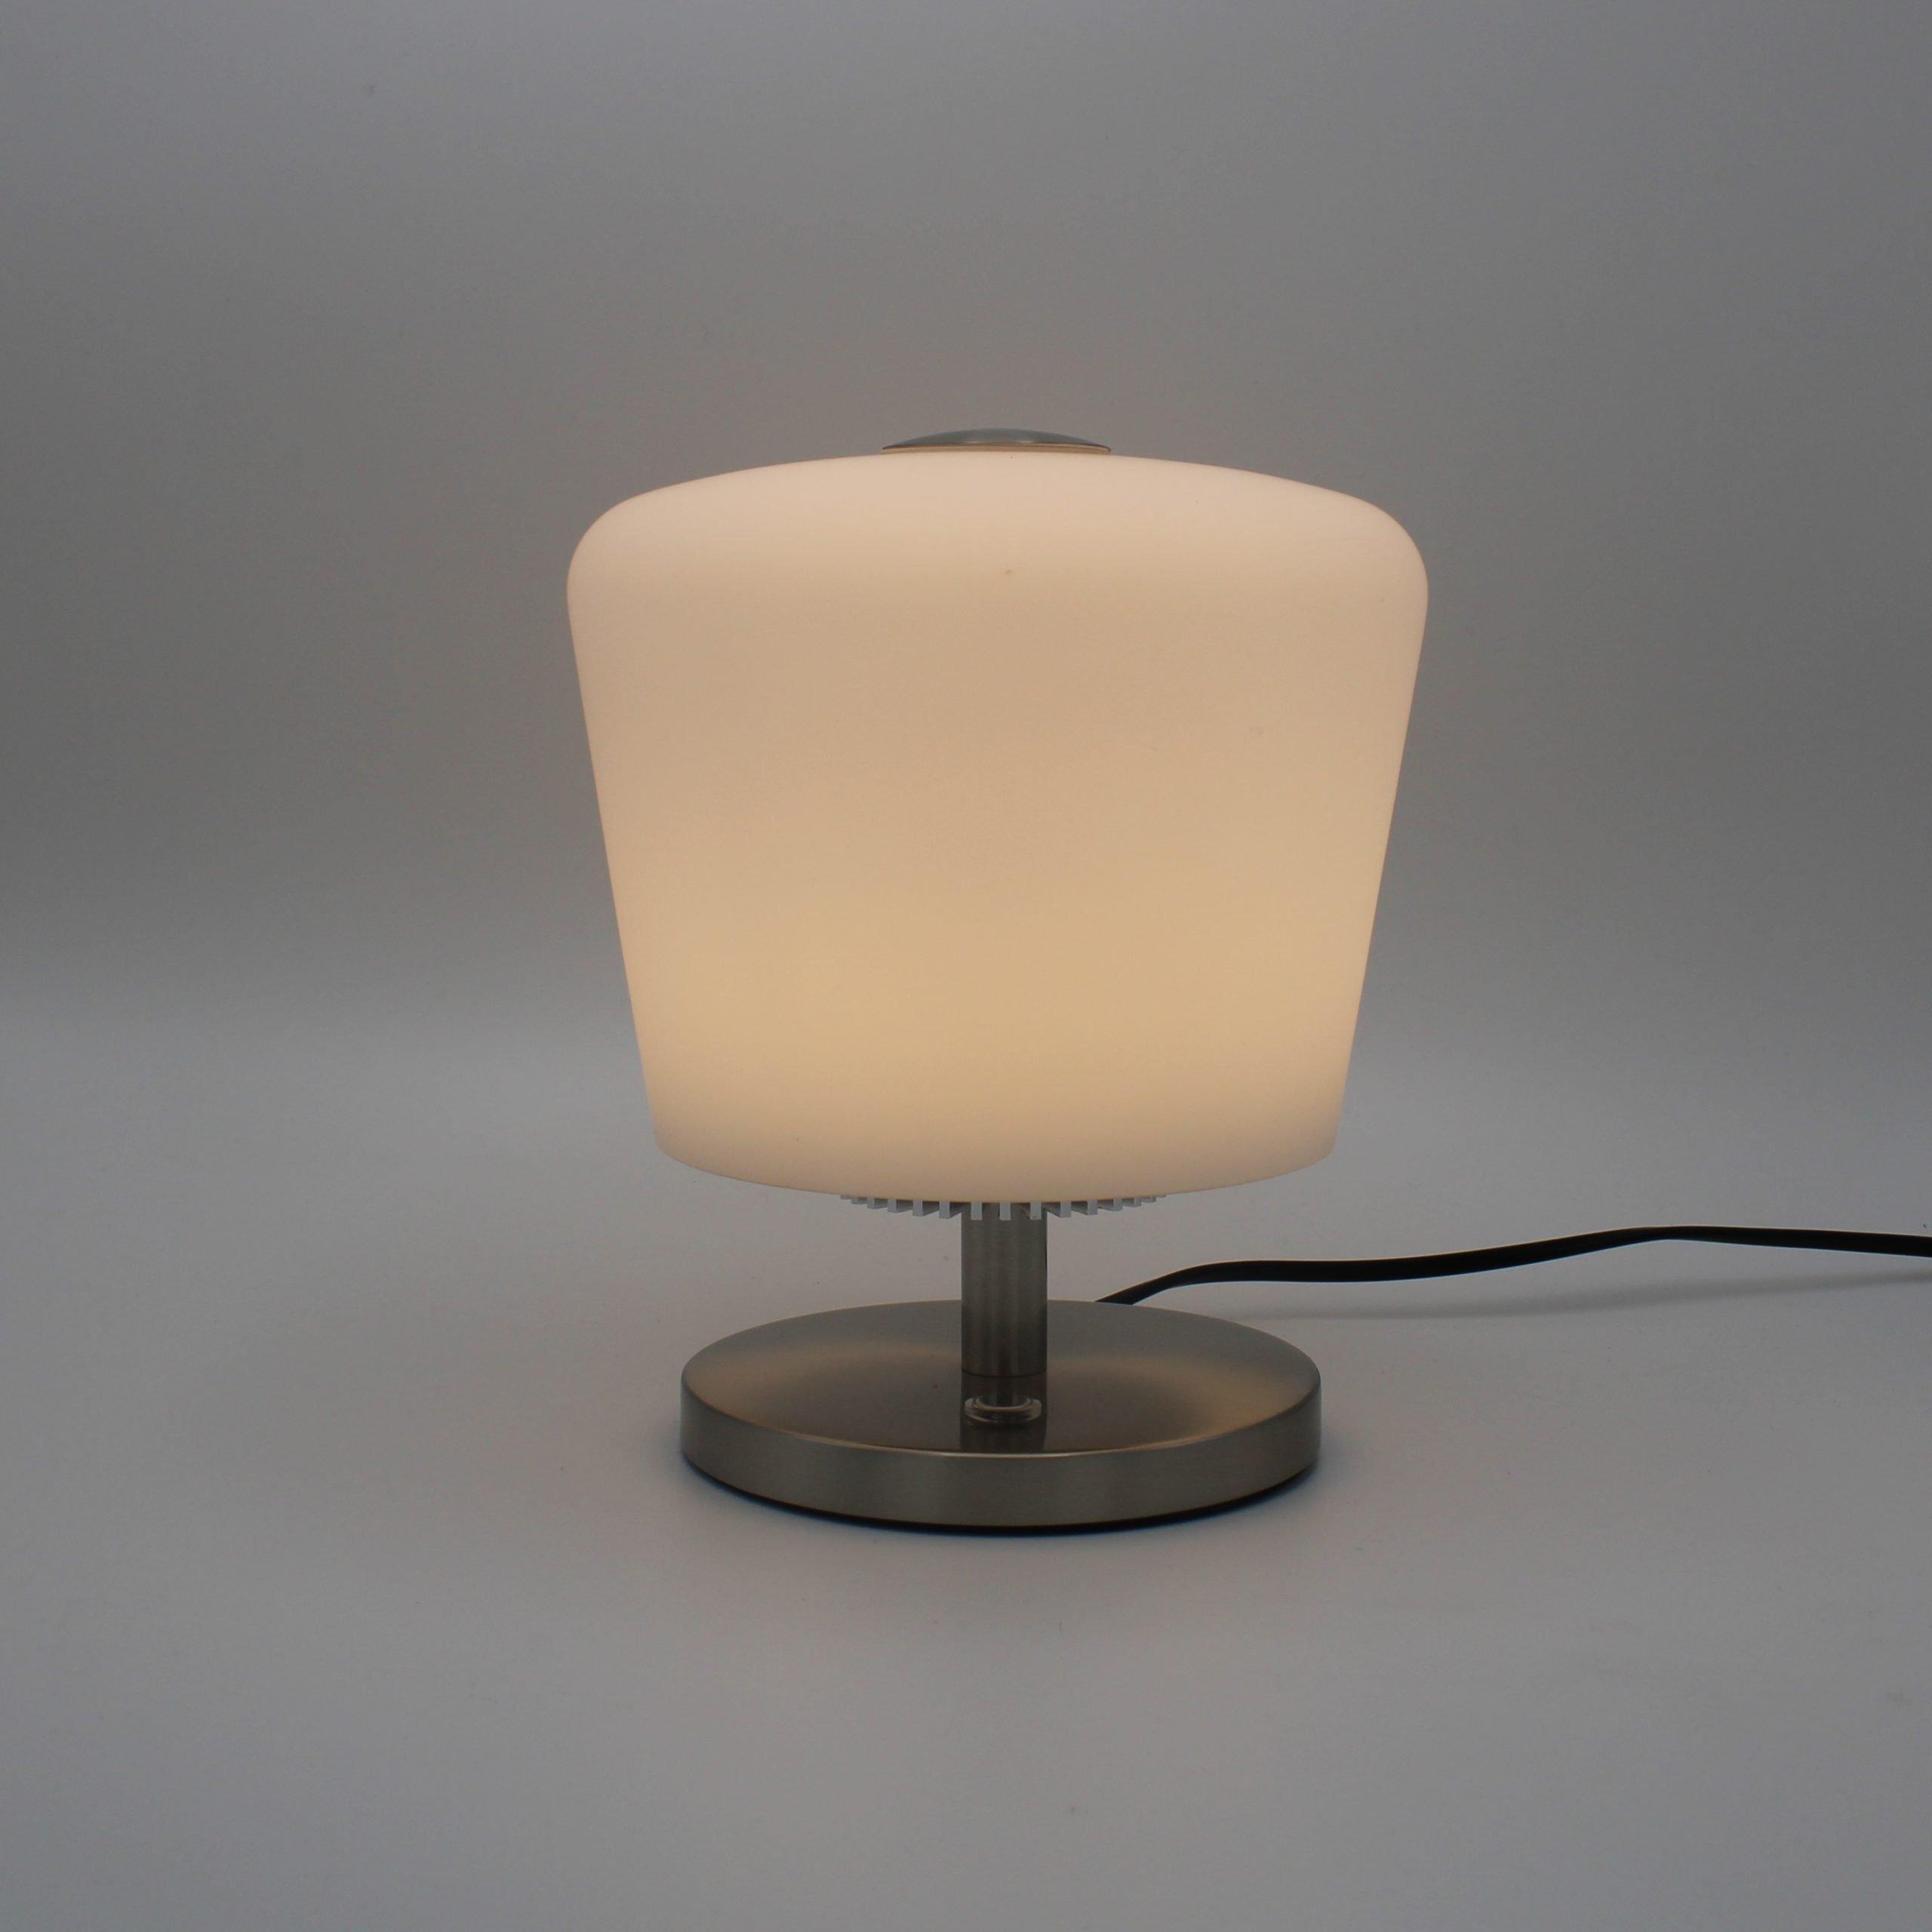 Dimbare sfeerlamp